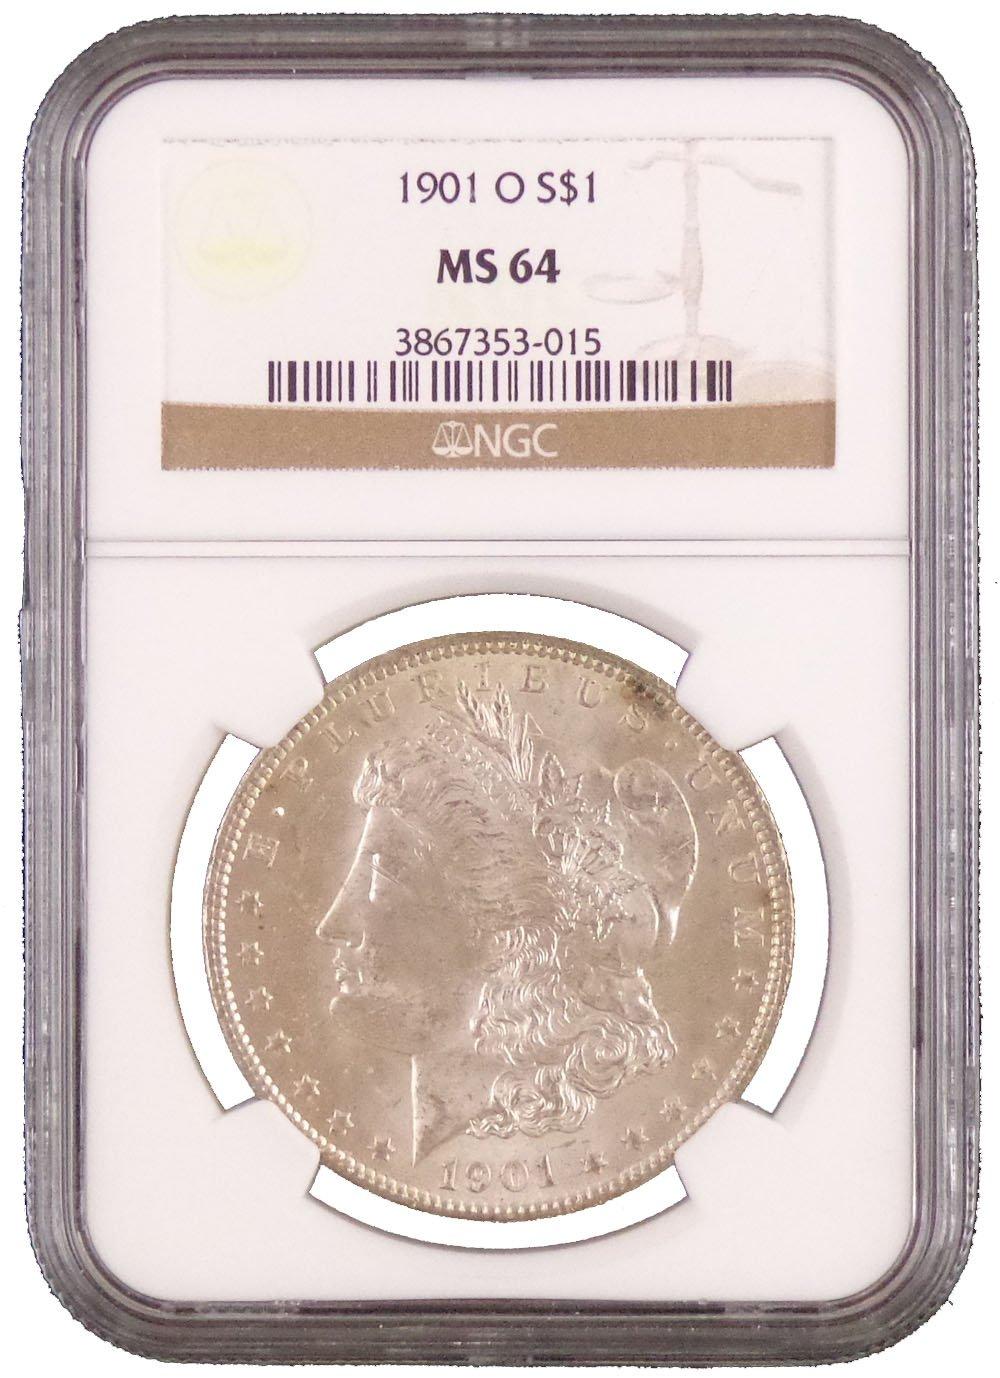 1900-O Morgan Silver Dollar NGC MS 64 White.